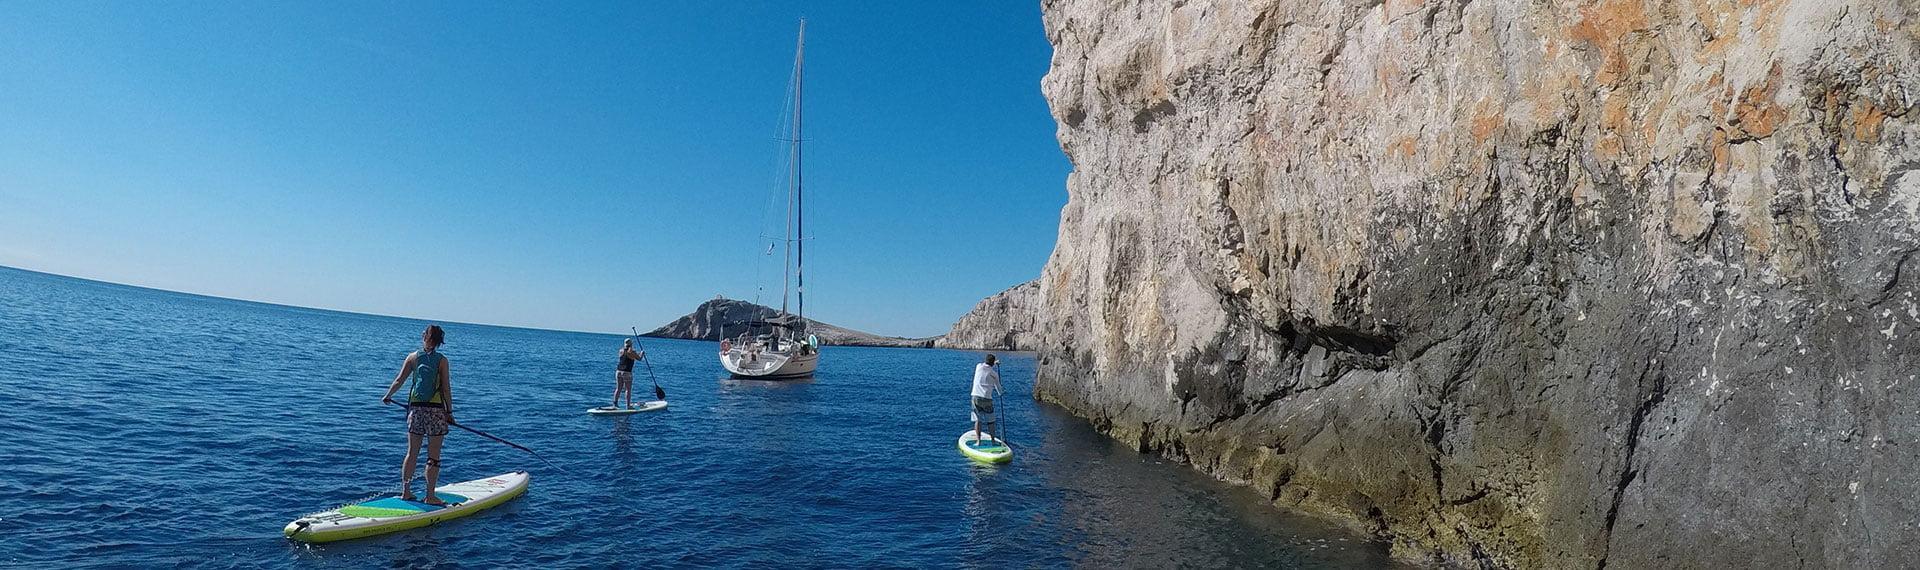 Sup ekspedicija med otoki Srednjega Jadrana